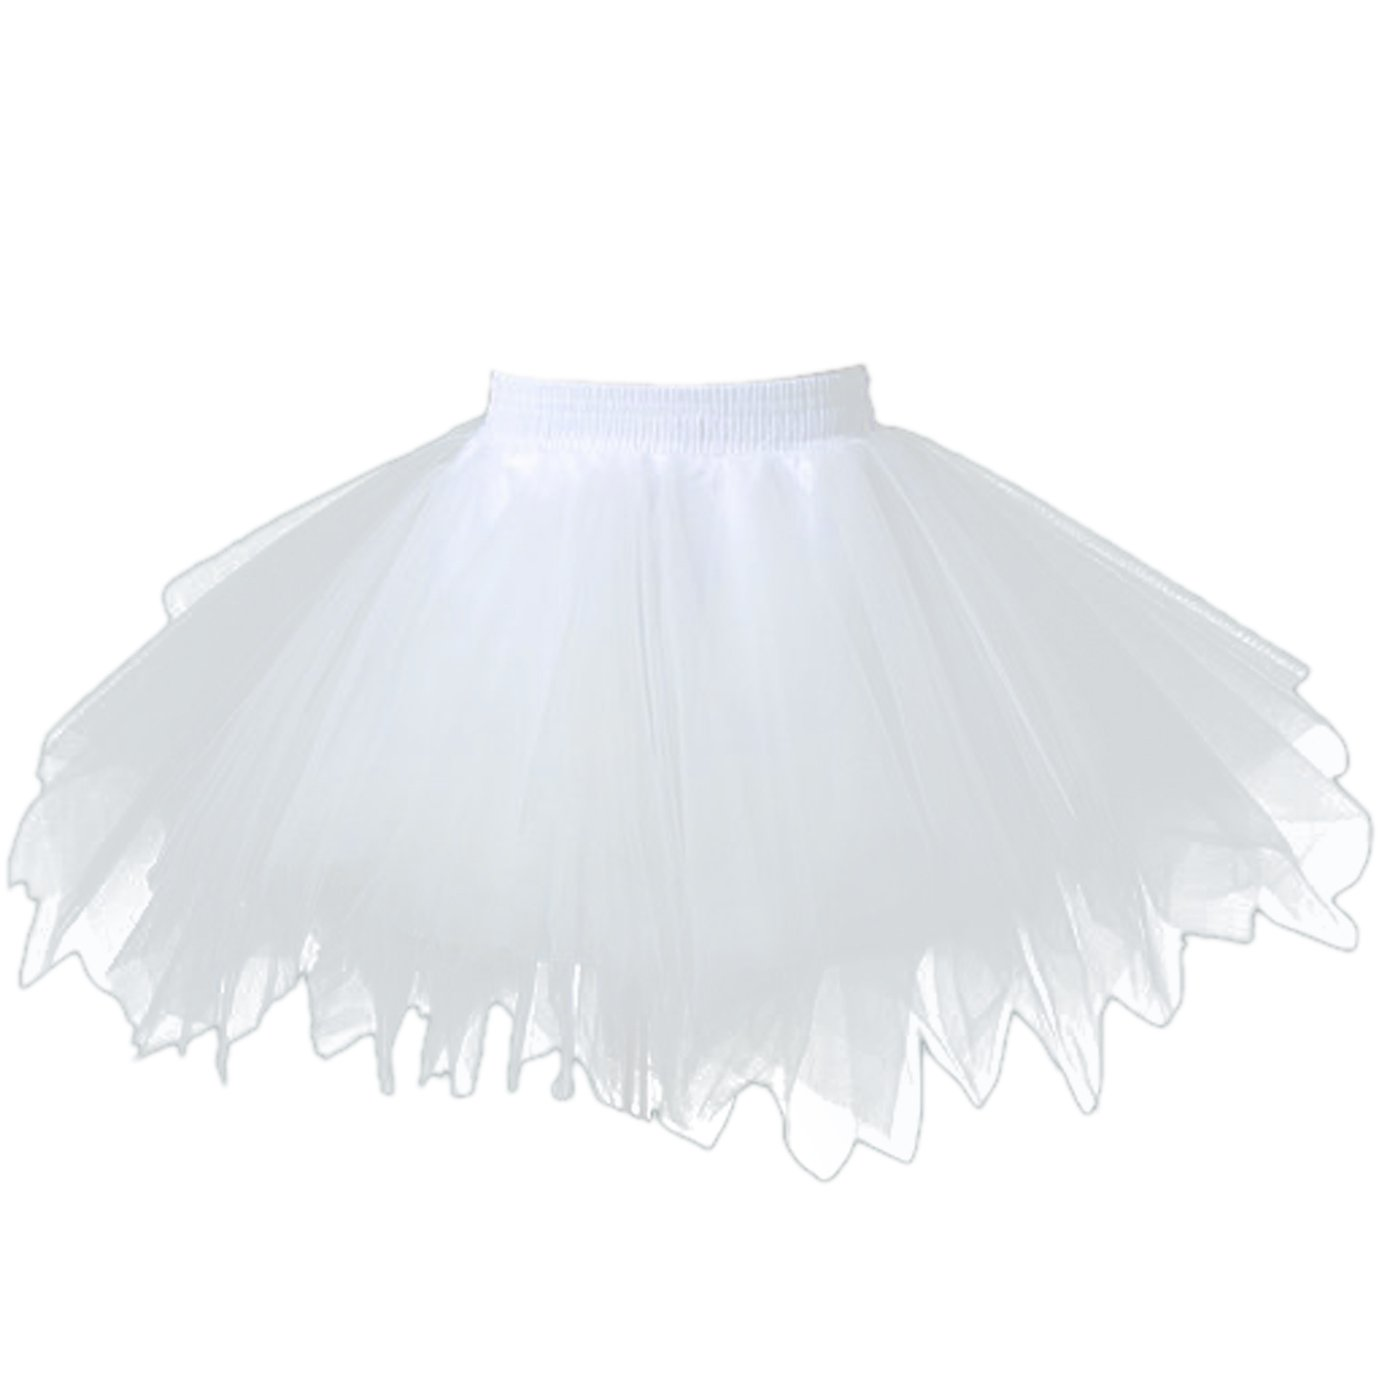 Dancina Girls Classic Ballet Tutu Poofy Organza Skirt Ages 2-7 /& Big Girls 8-13